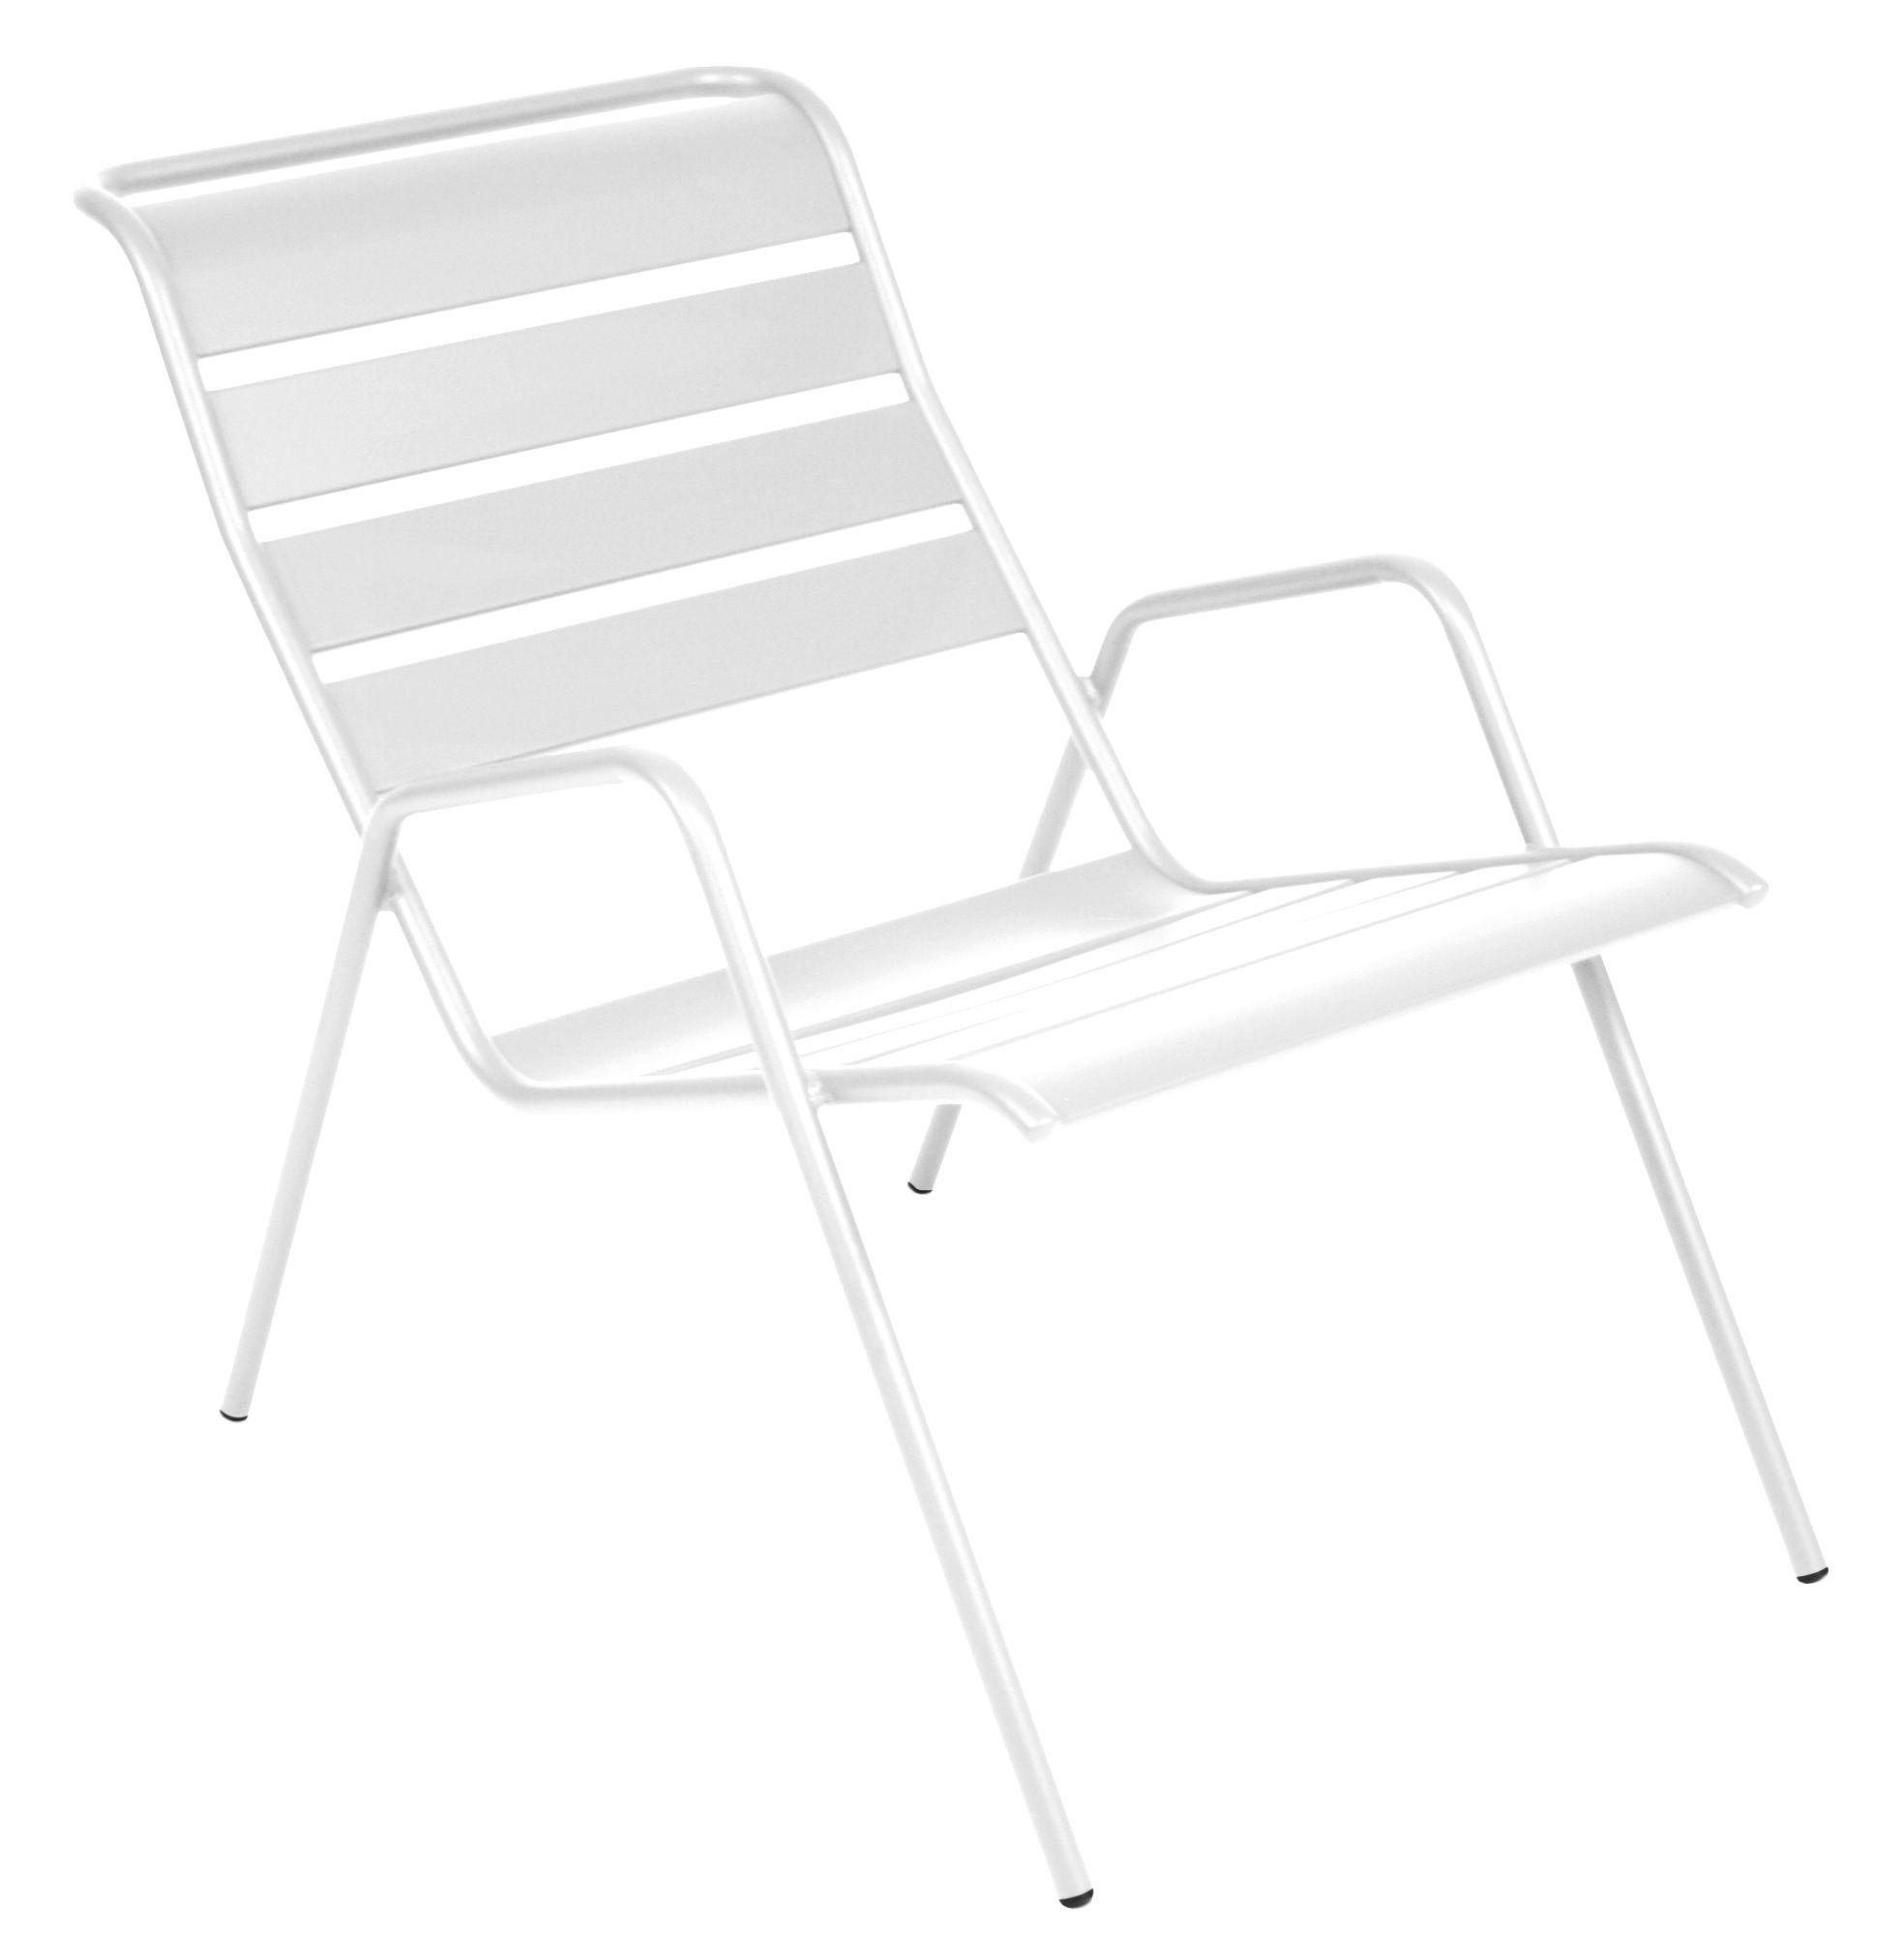 Möbel - Lounge Sessel - Monceau Lounge Sessel / stapelbar - Fermob - Baumwollweiß - bemalter Stahl